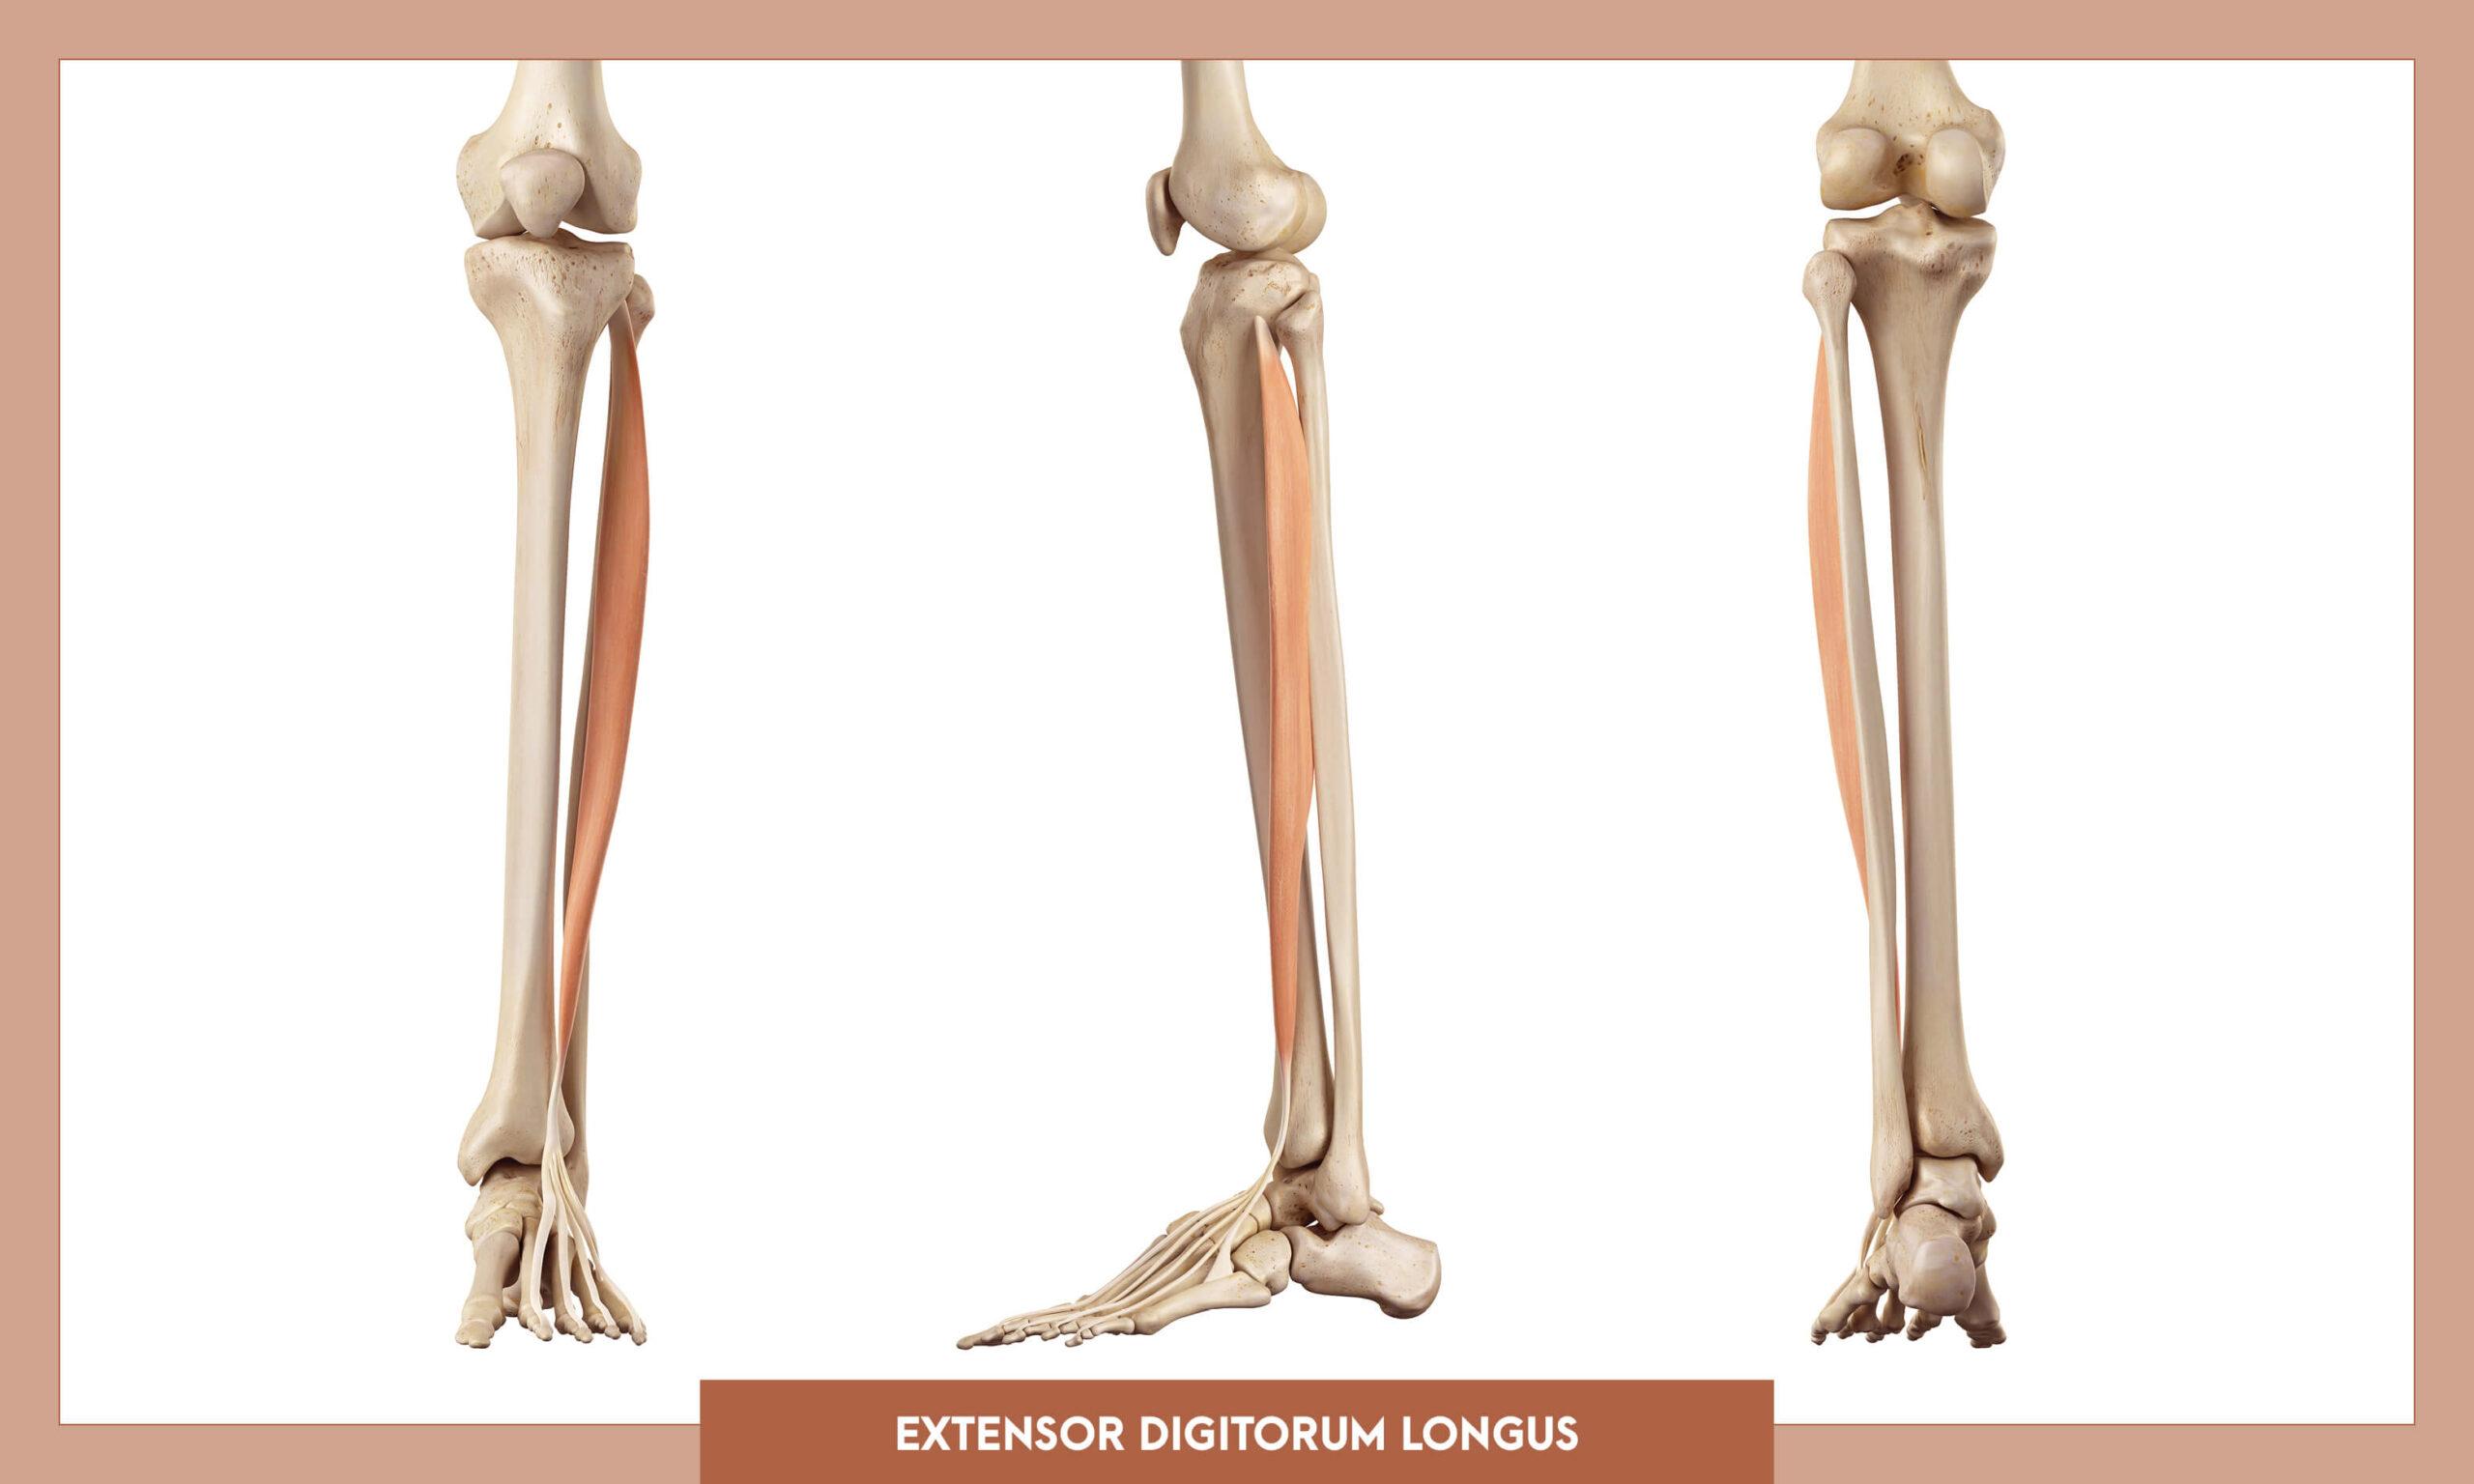 Muscles of thee Lower Limb - Extensor digitorum longus